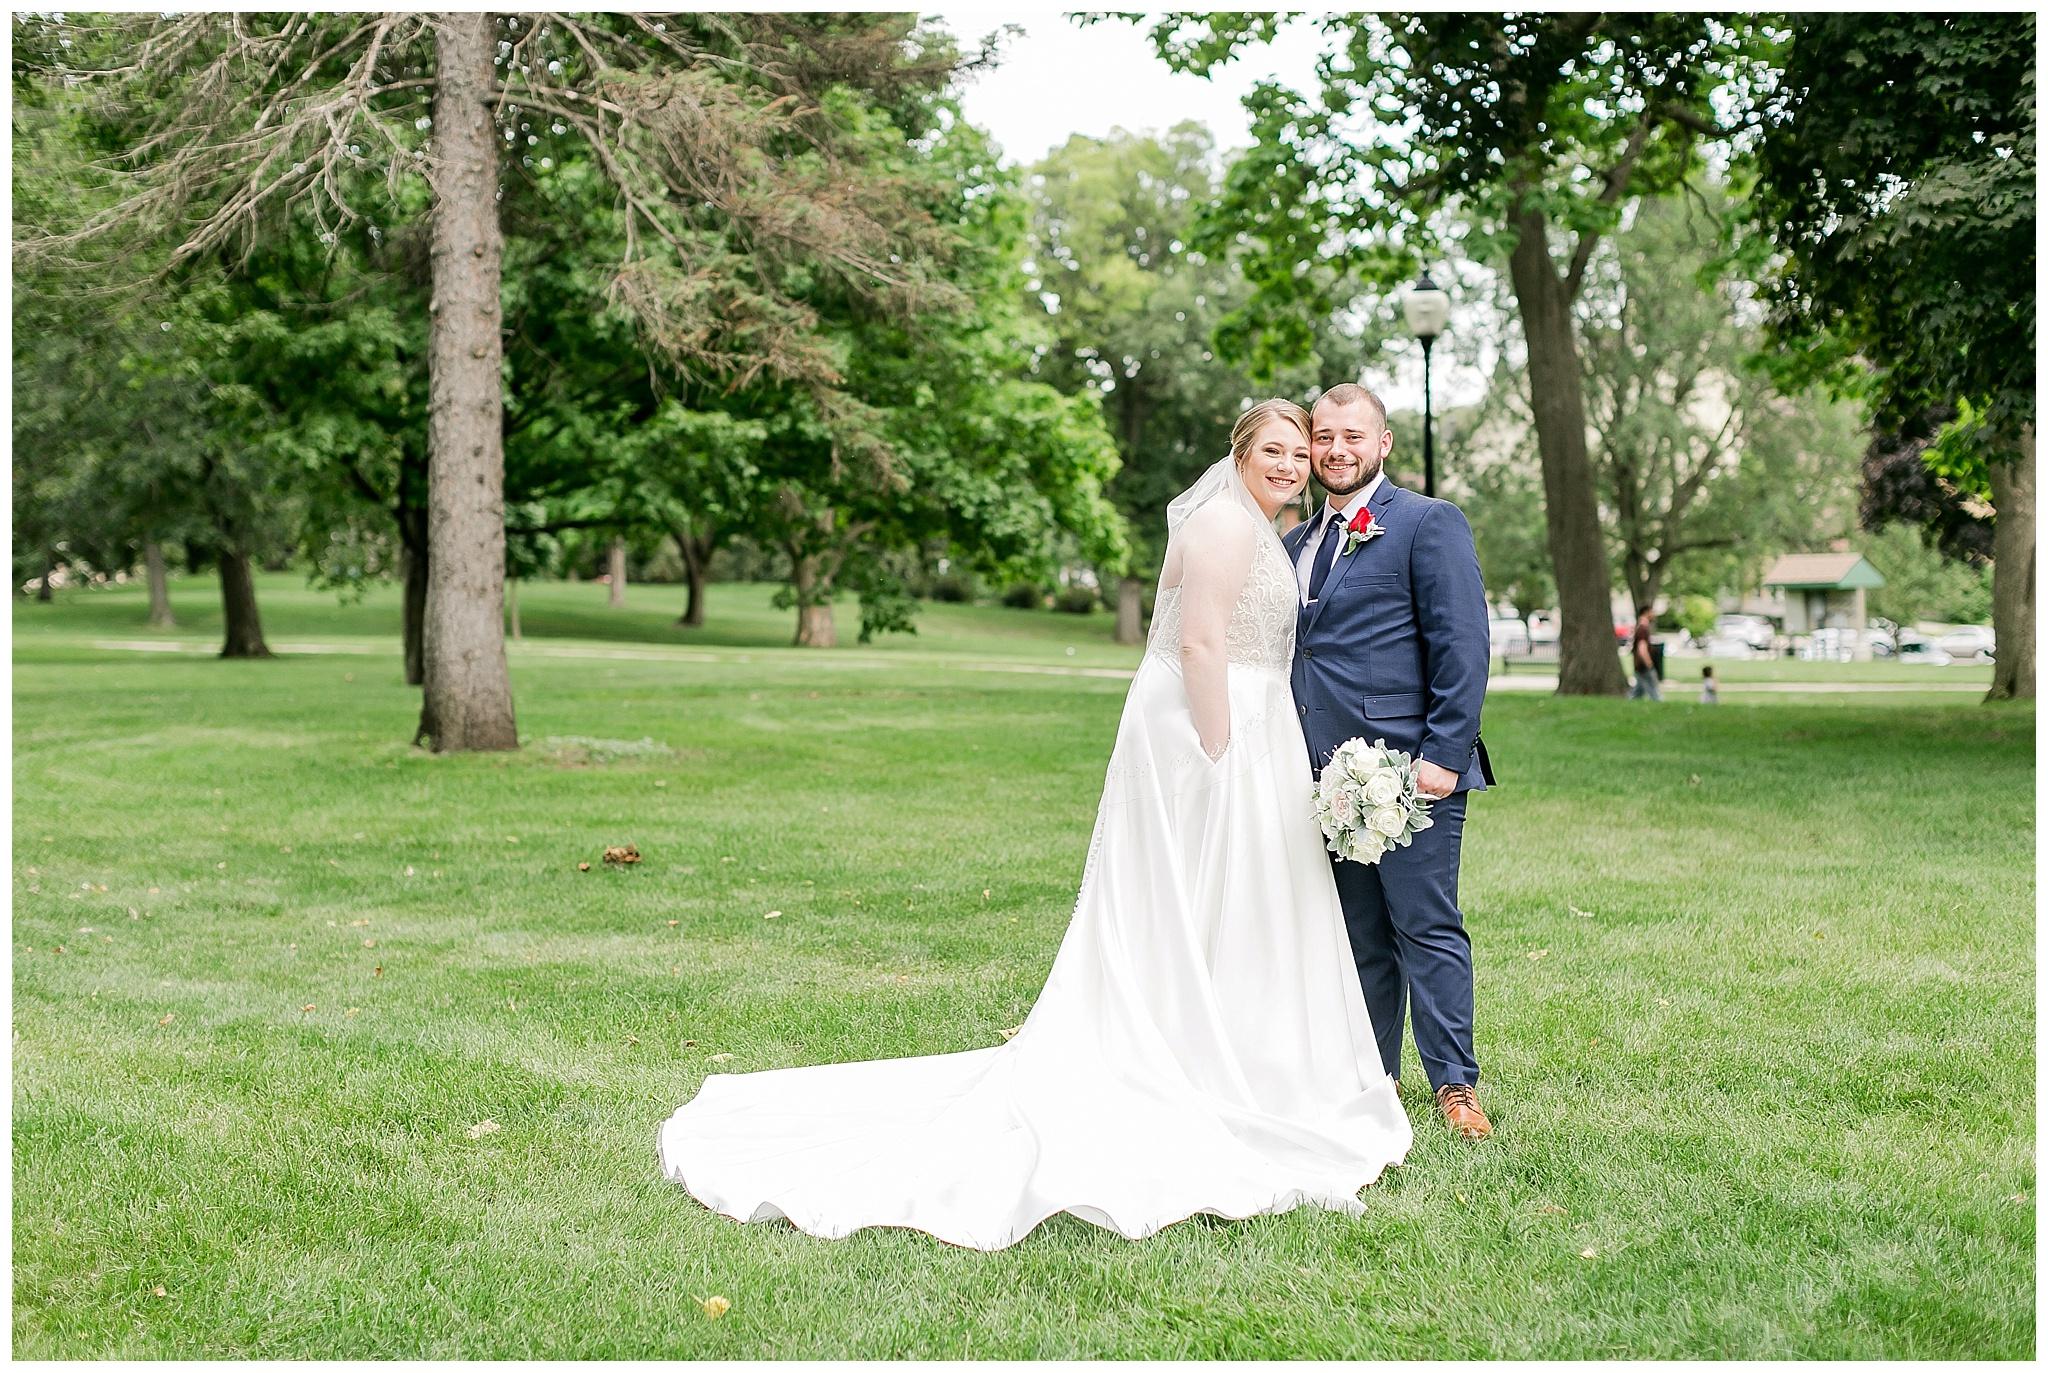 la_casa_grande_wedding_beloit_wisconsin_caynay_photo_0032.jpg